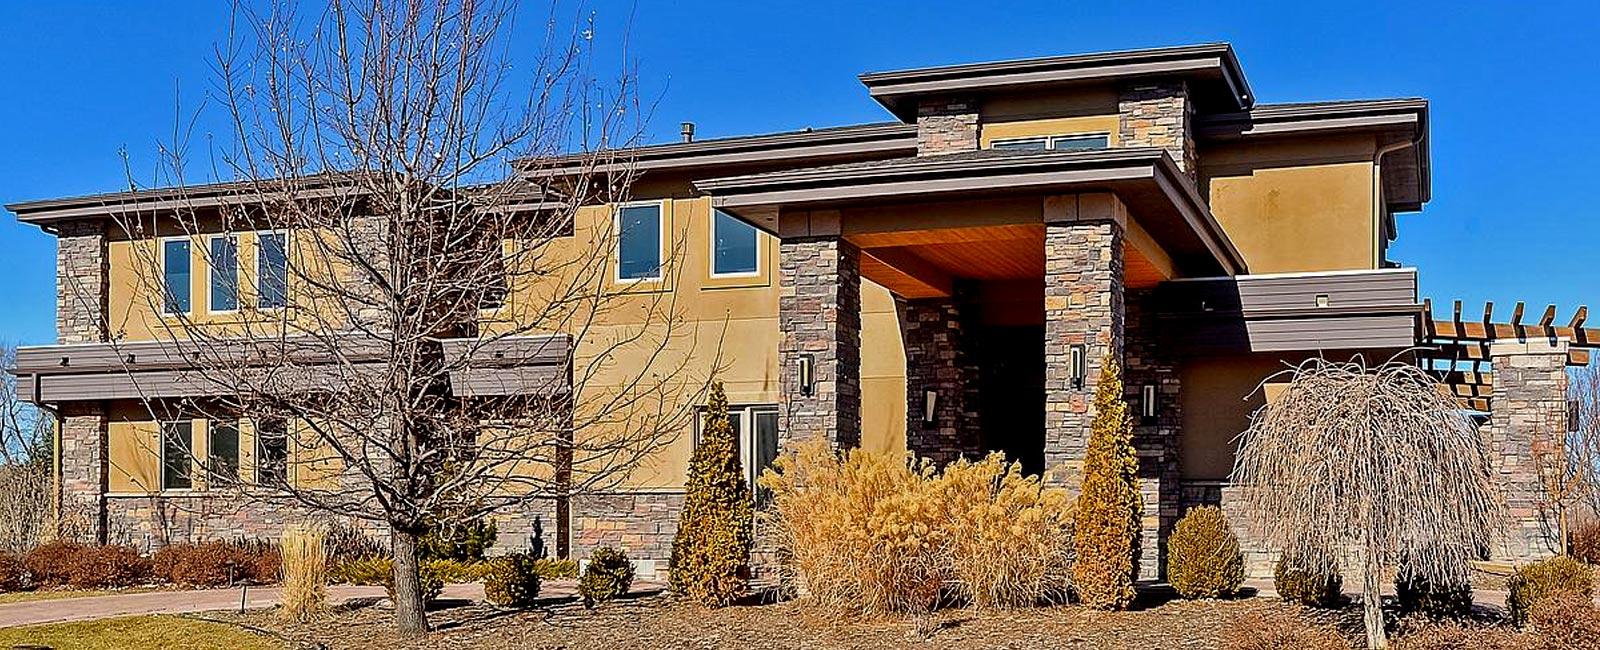 Frank lloyd wright 39 s iconic prairie style architecture - Frank lloyd wright architecture style ...